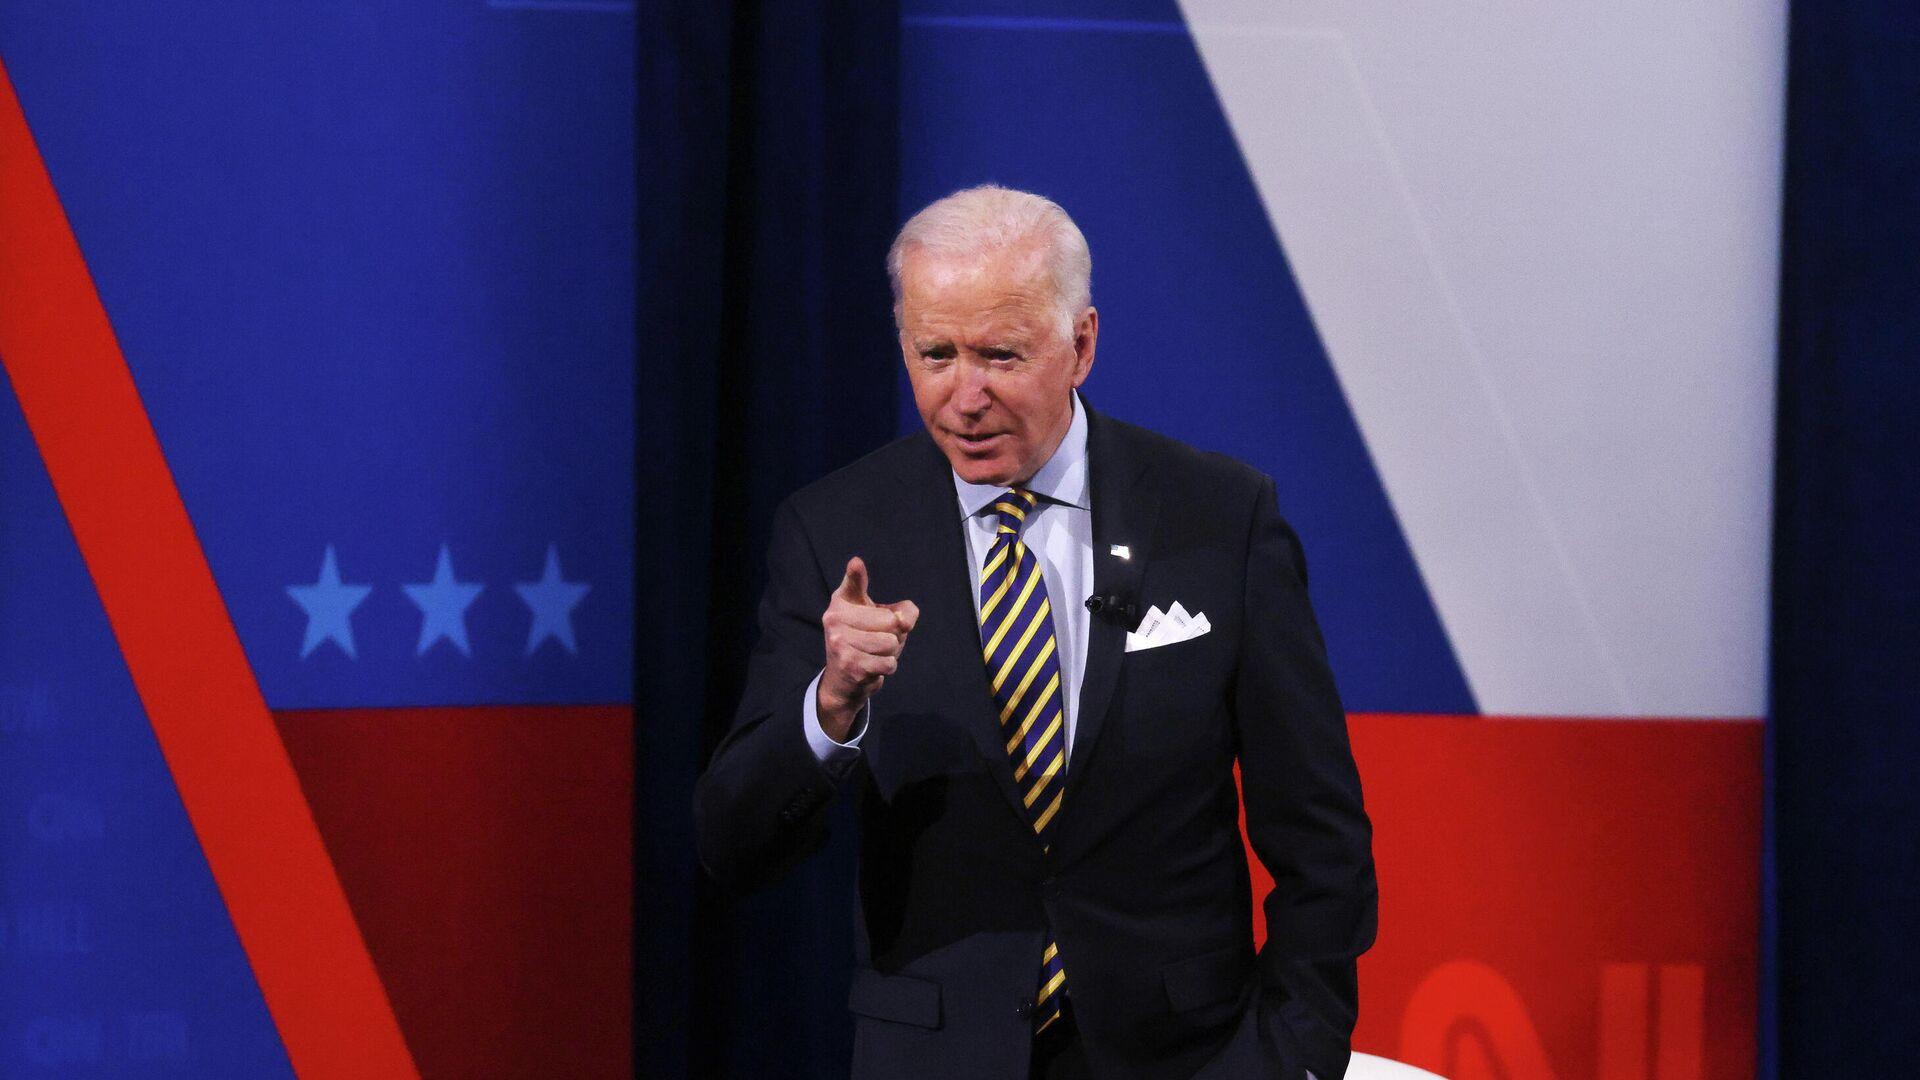 Joe Biden, presidente de EEUU - Sputnik Mundo, 1920, 17.02.2021